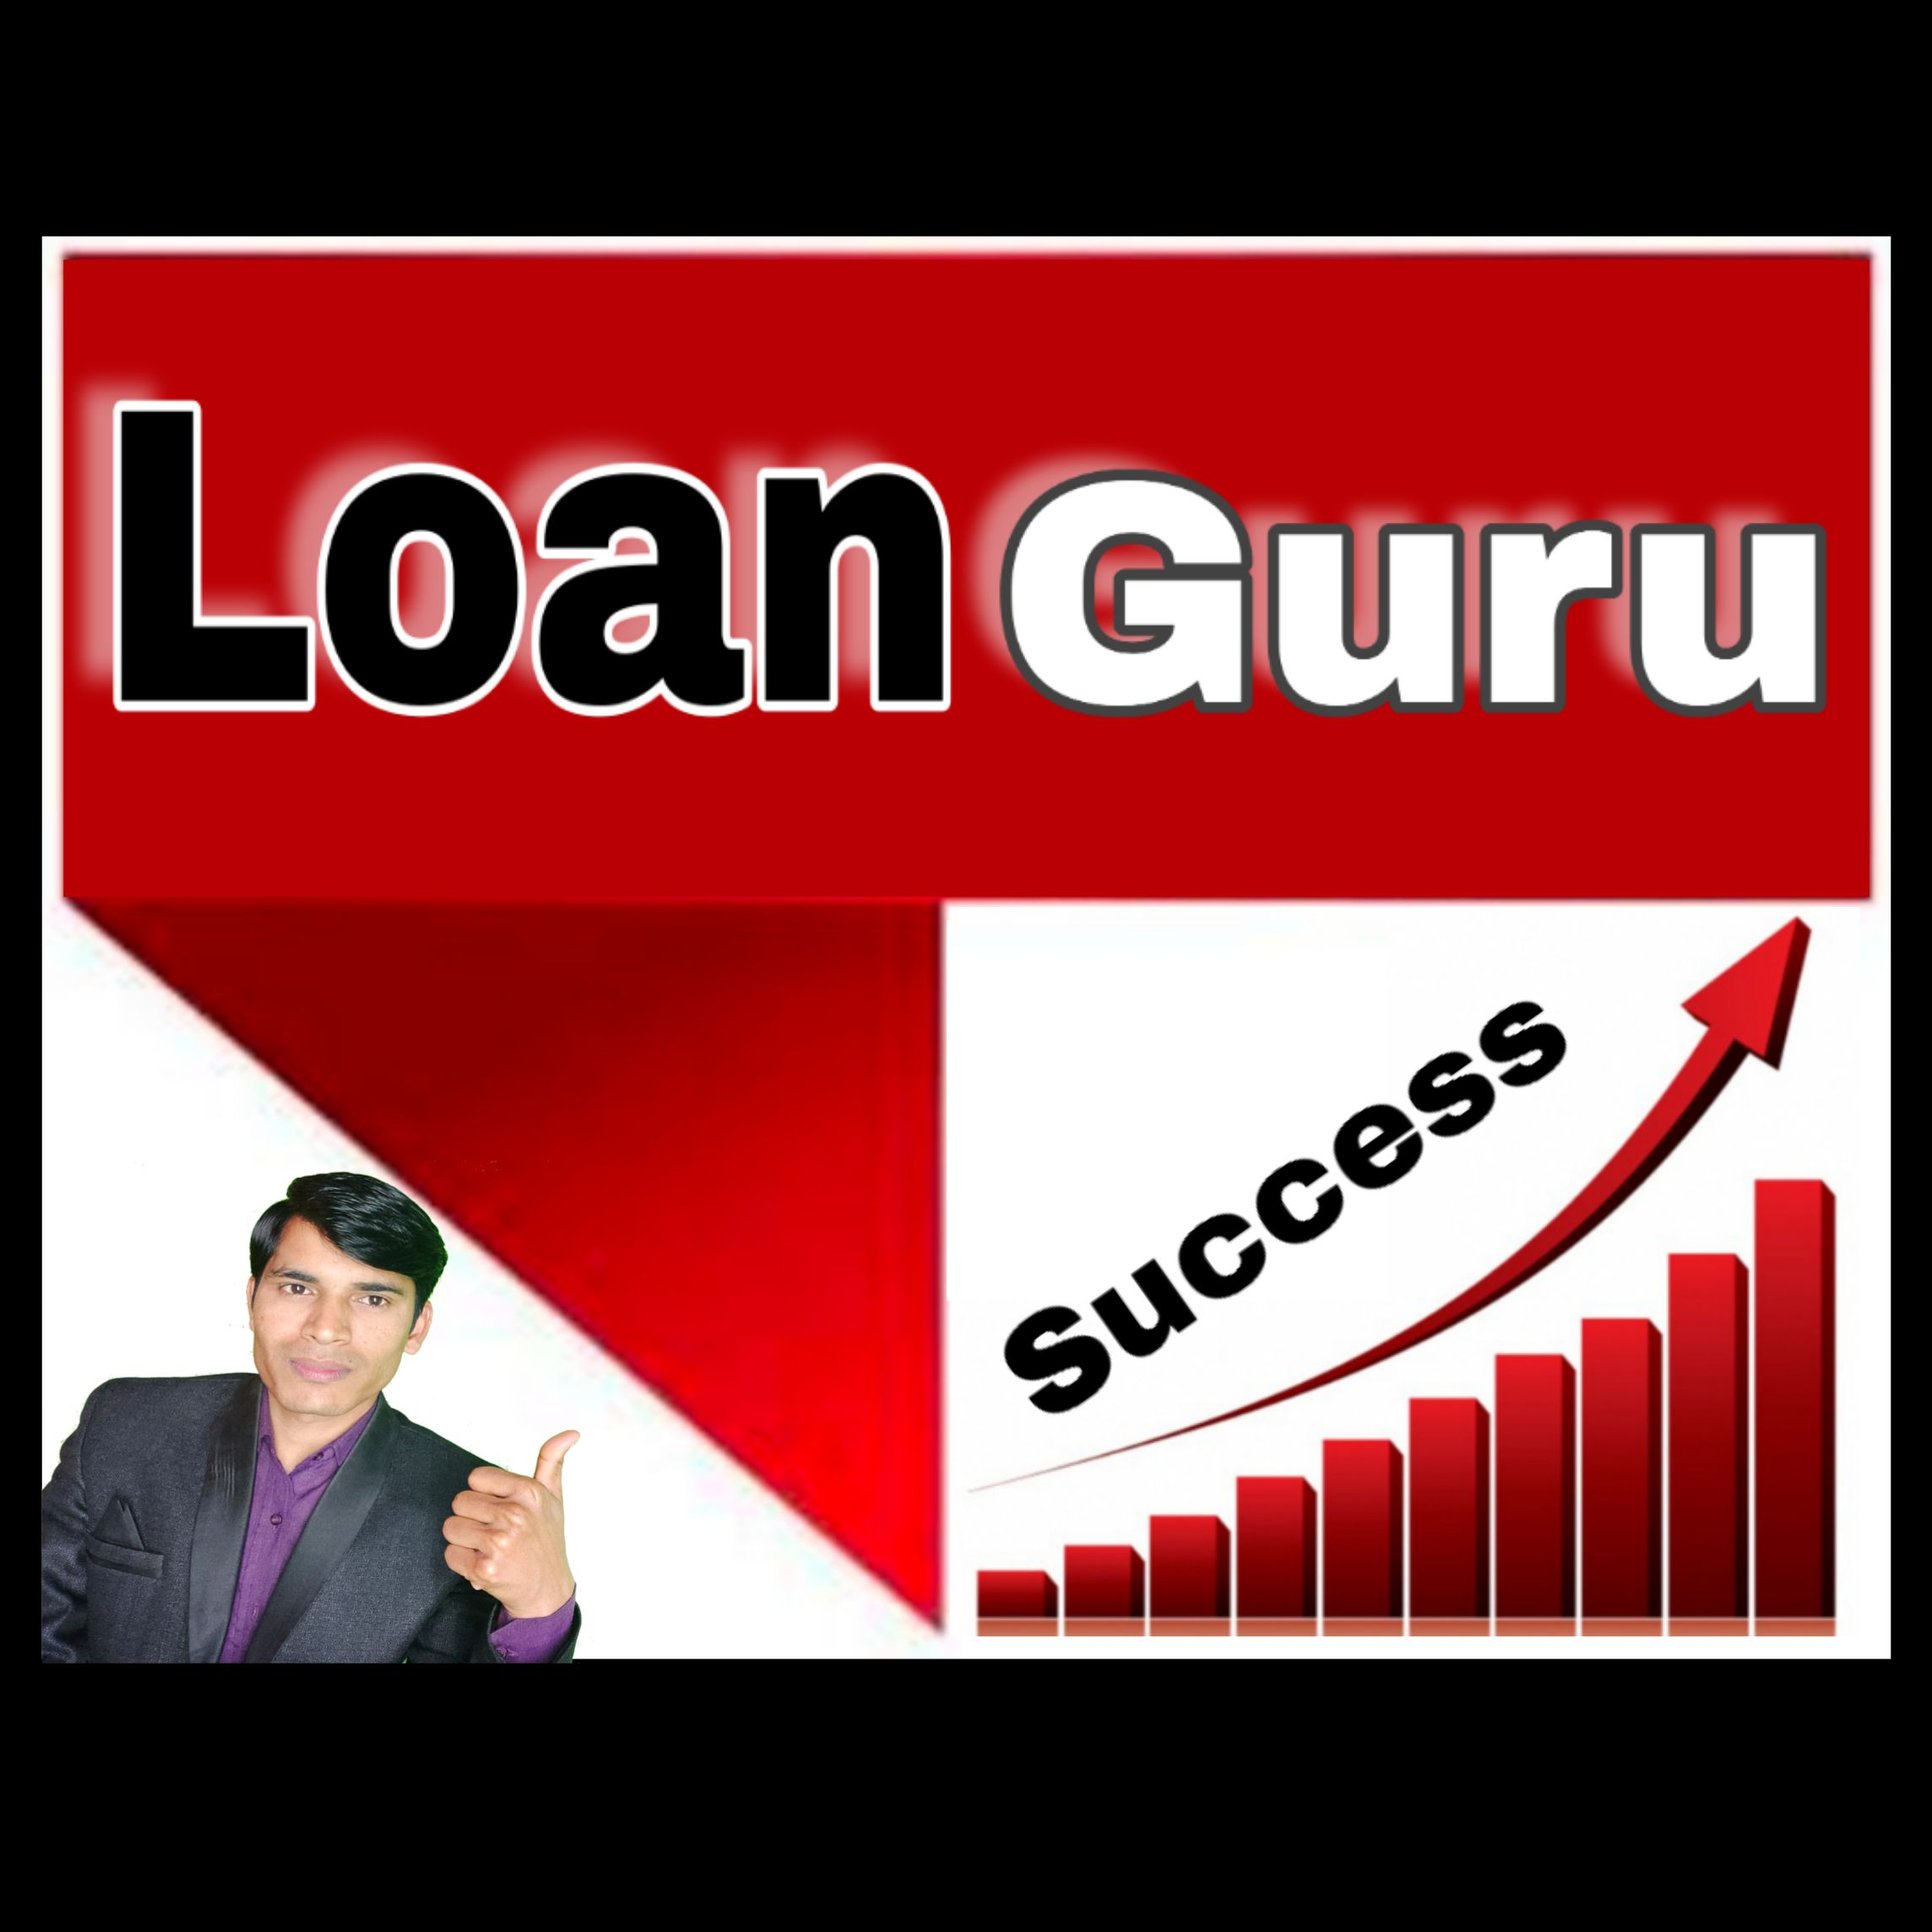 Loan Guru